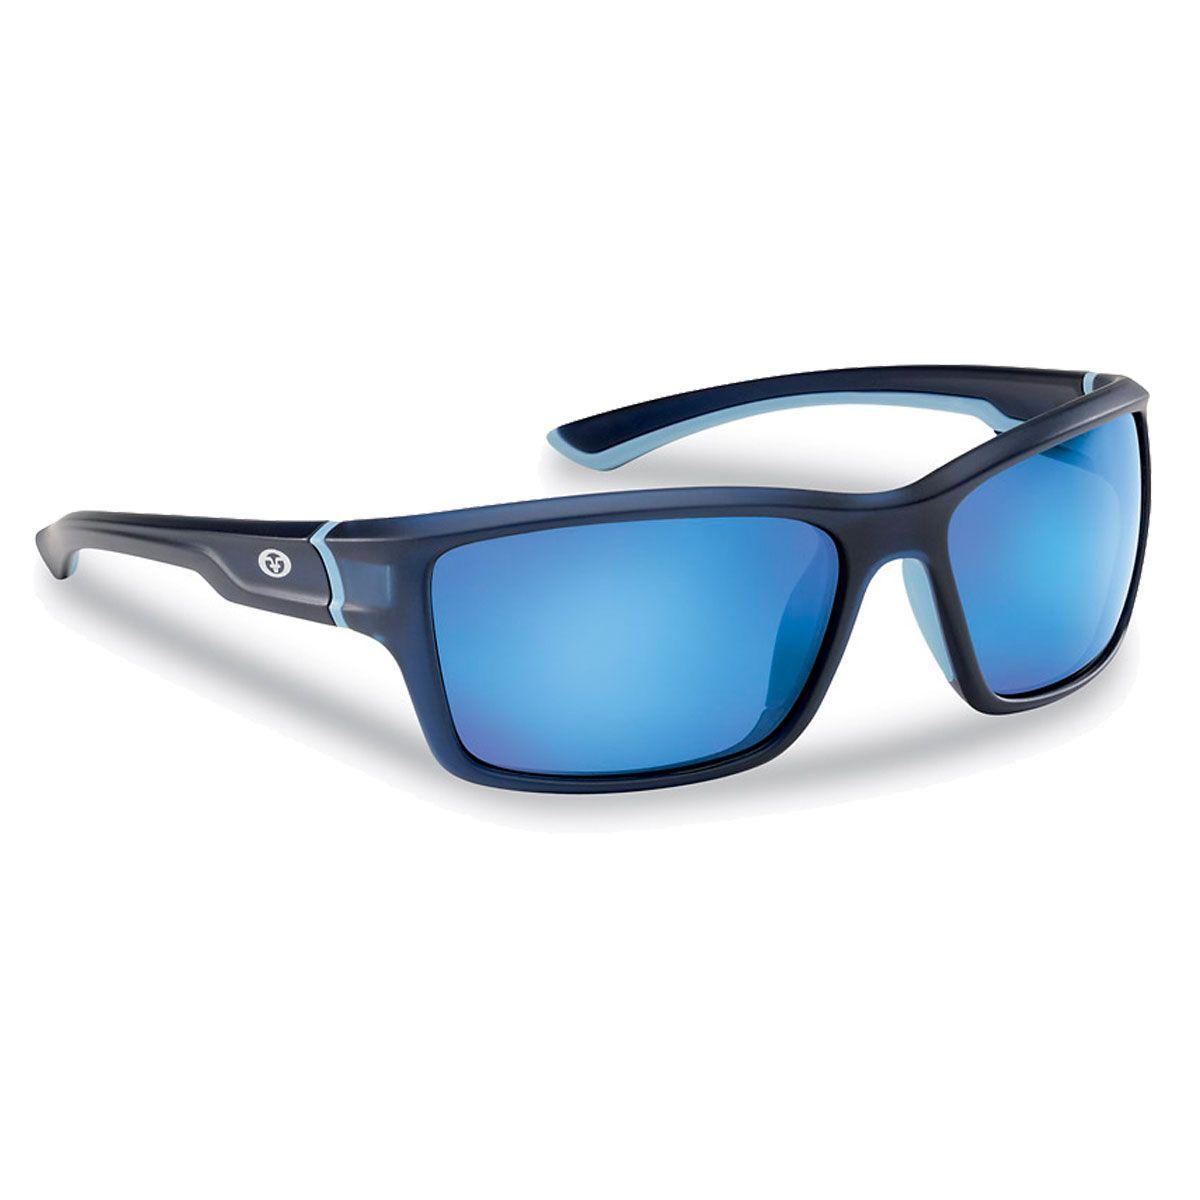 Upsidedown Γυαλιά ηλίου μηχανής Flying Fisherman COVE Navy Blue Mirror  Polarized 959c2449441